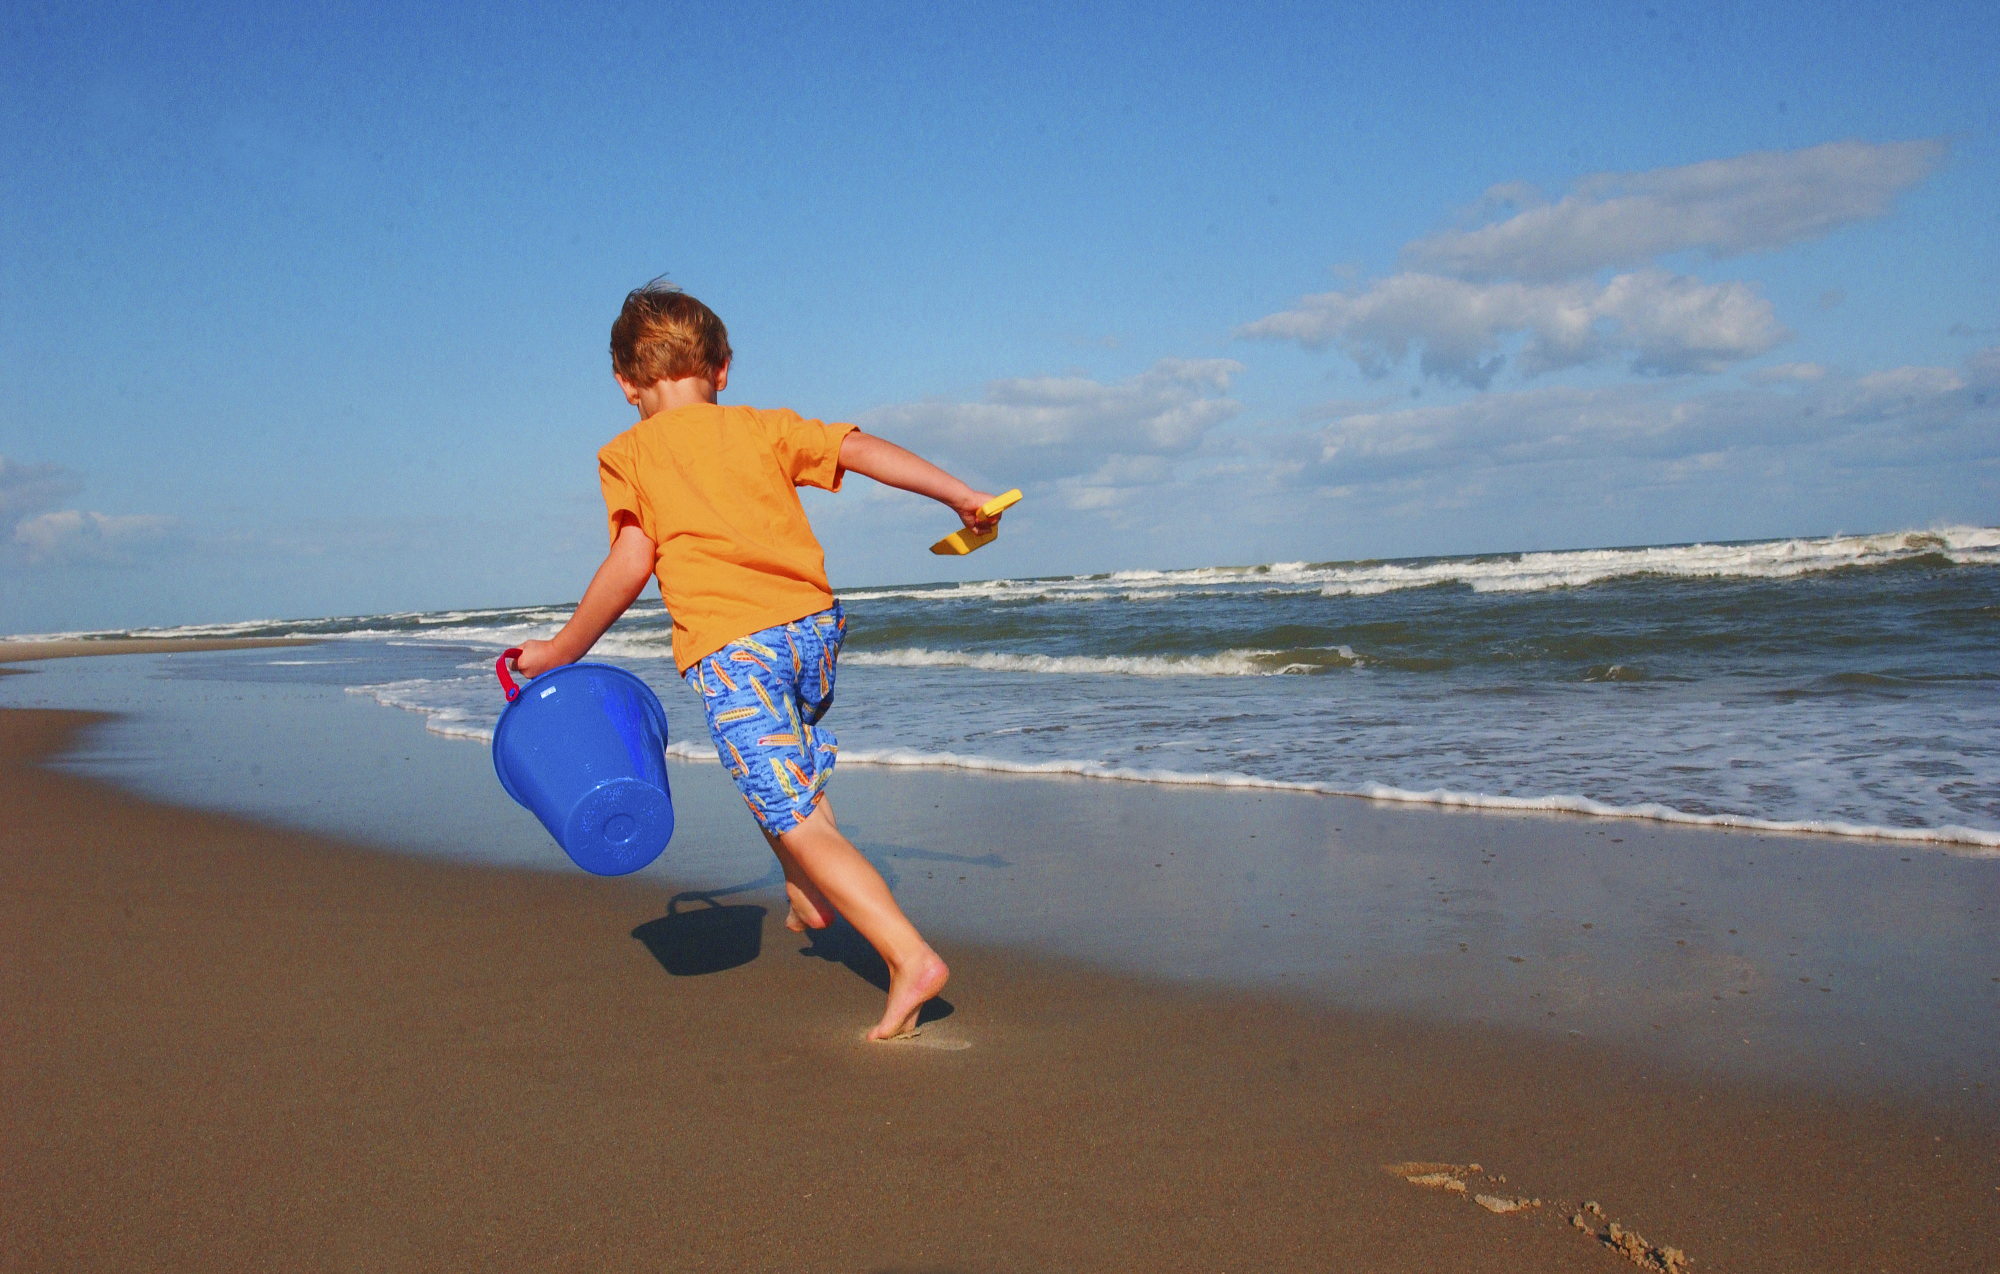 Travel_Best_Beaches_56601-159532.jpg02401128